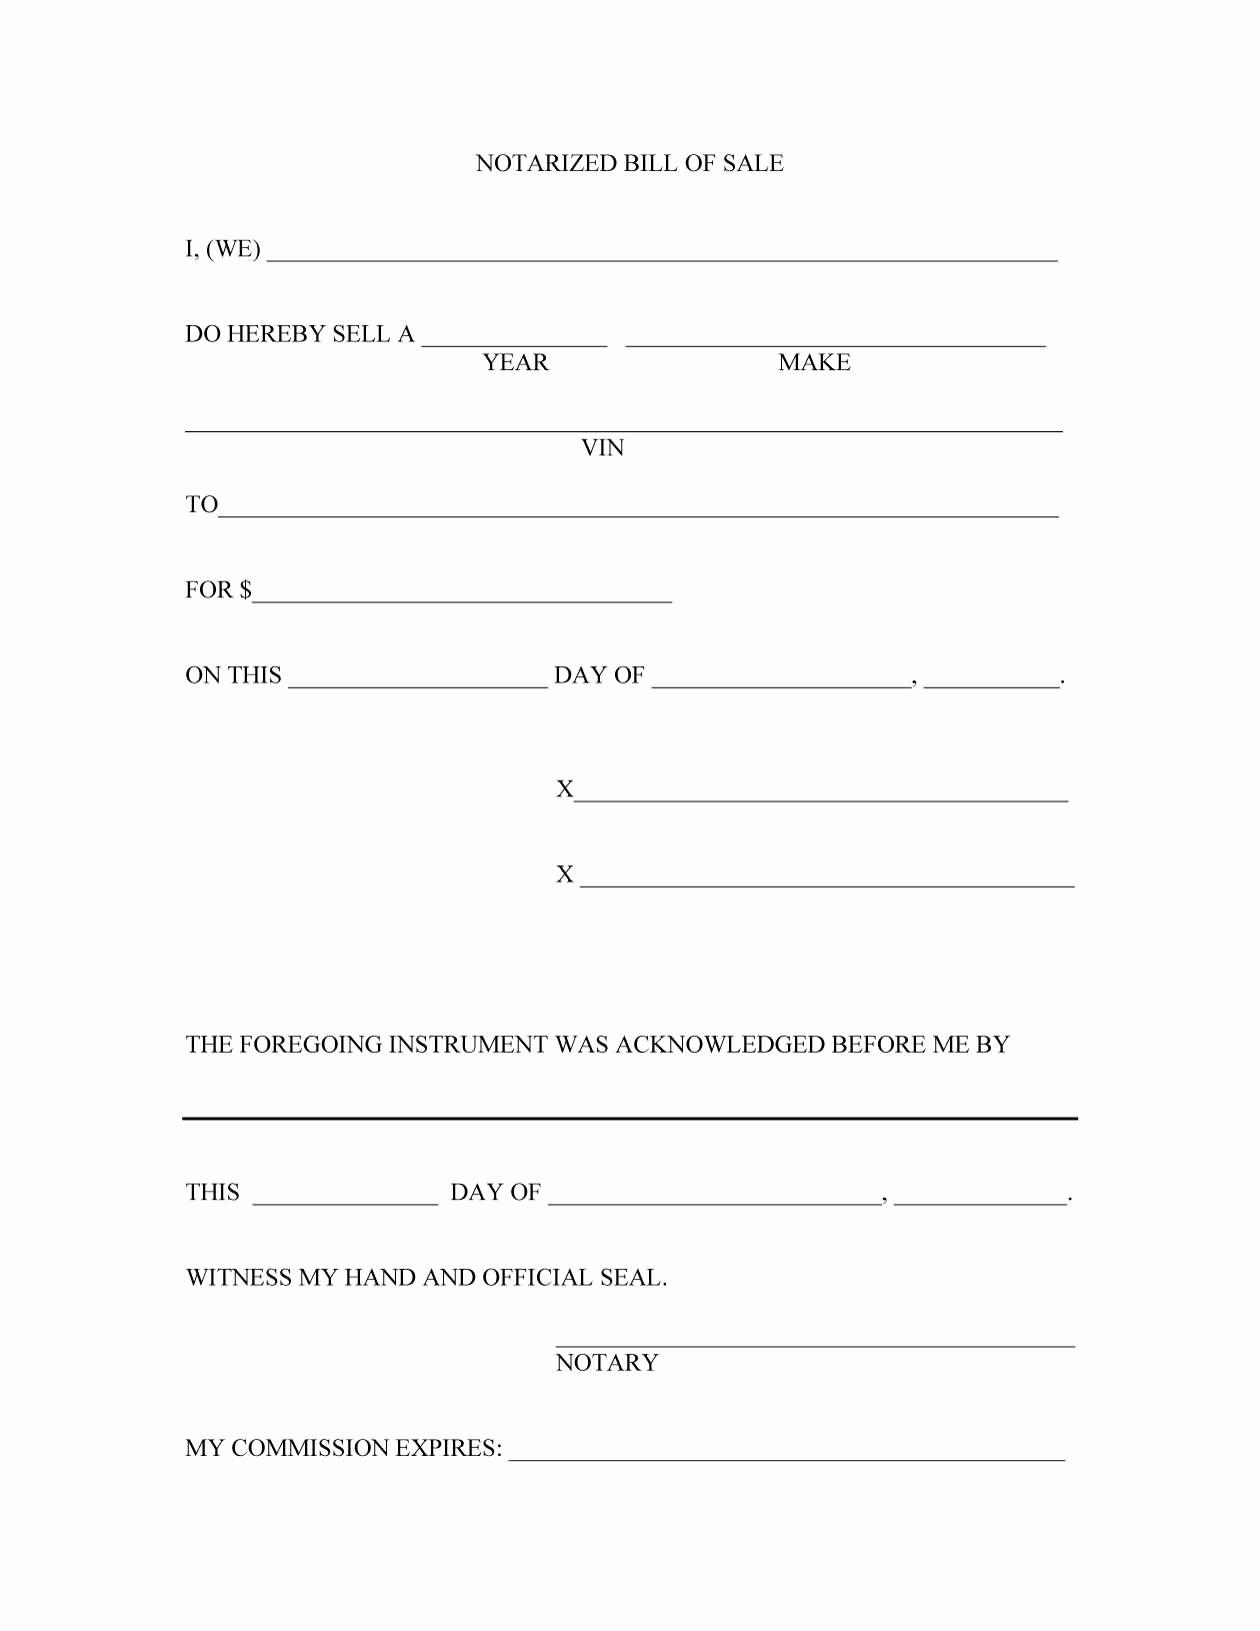 Bill Of Sale Sample form Fresh 45 Fee Printable Bill Of Sale Templates Car Boat Gun